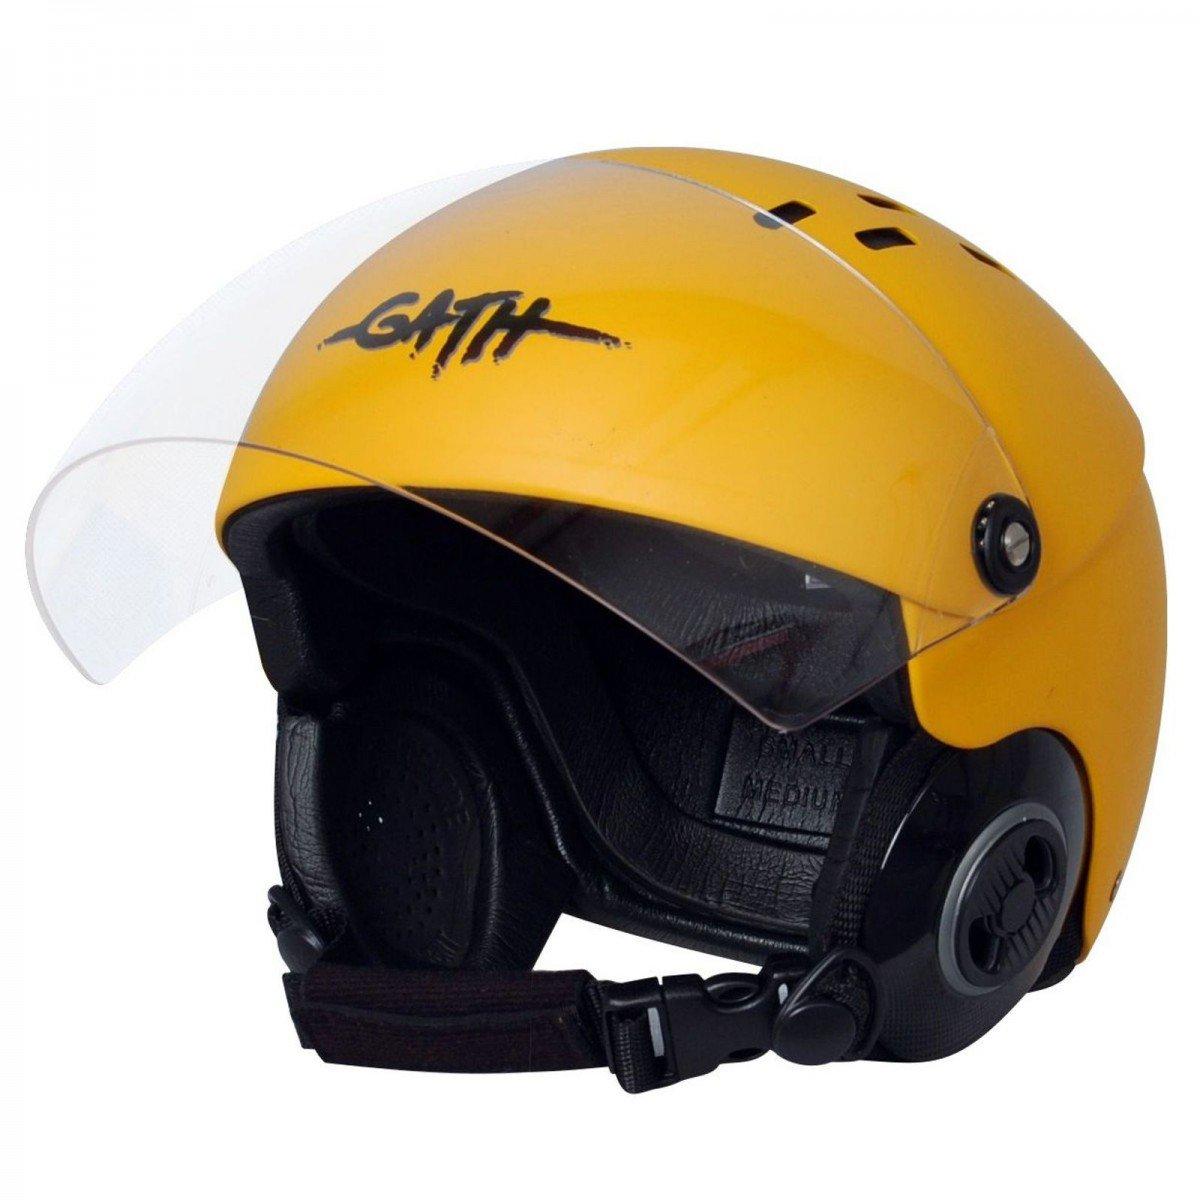 Casco gath Rescue safety Amarillo mate talla M: Amazon.es: Deportes y aire libre